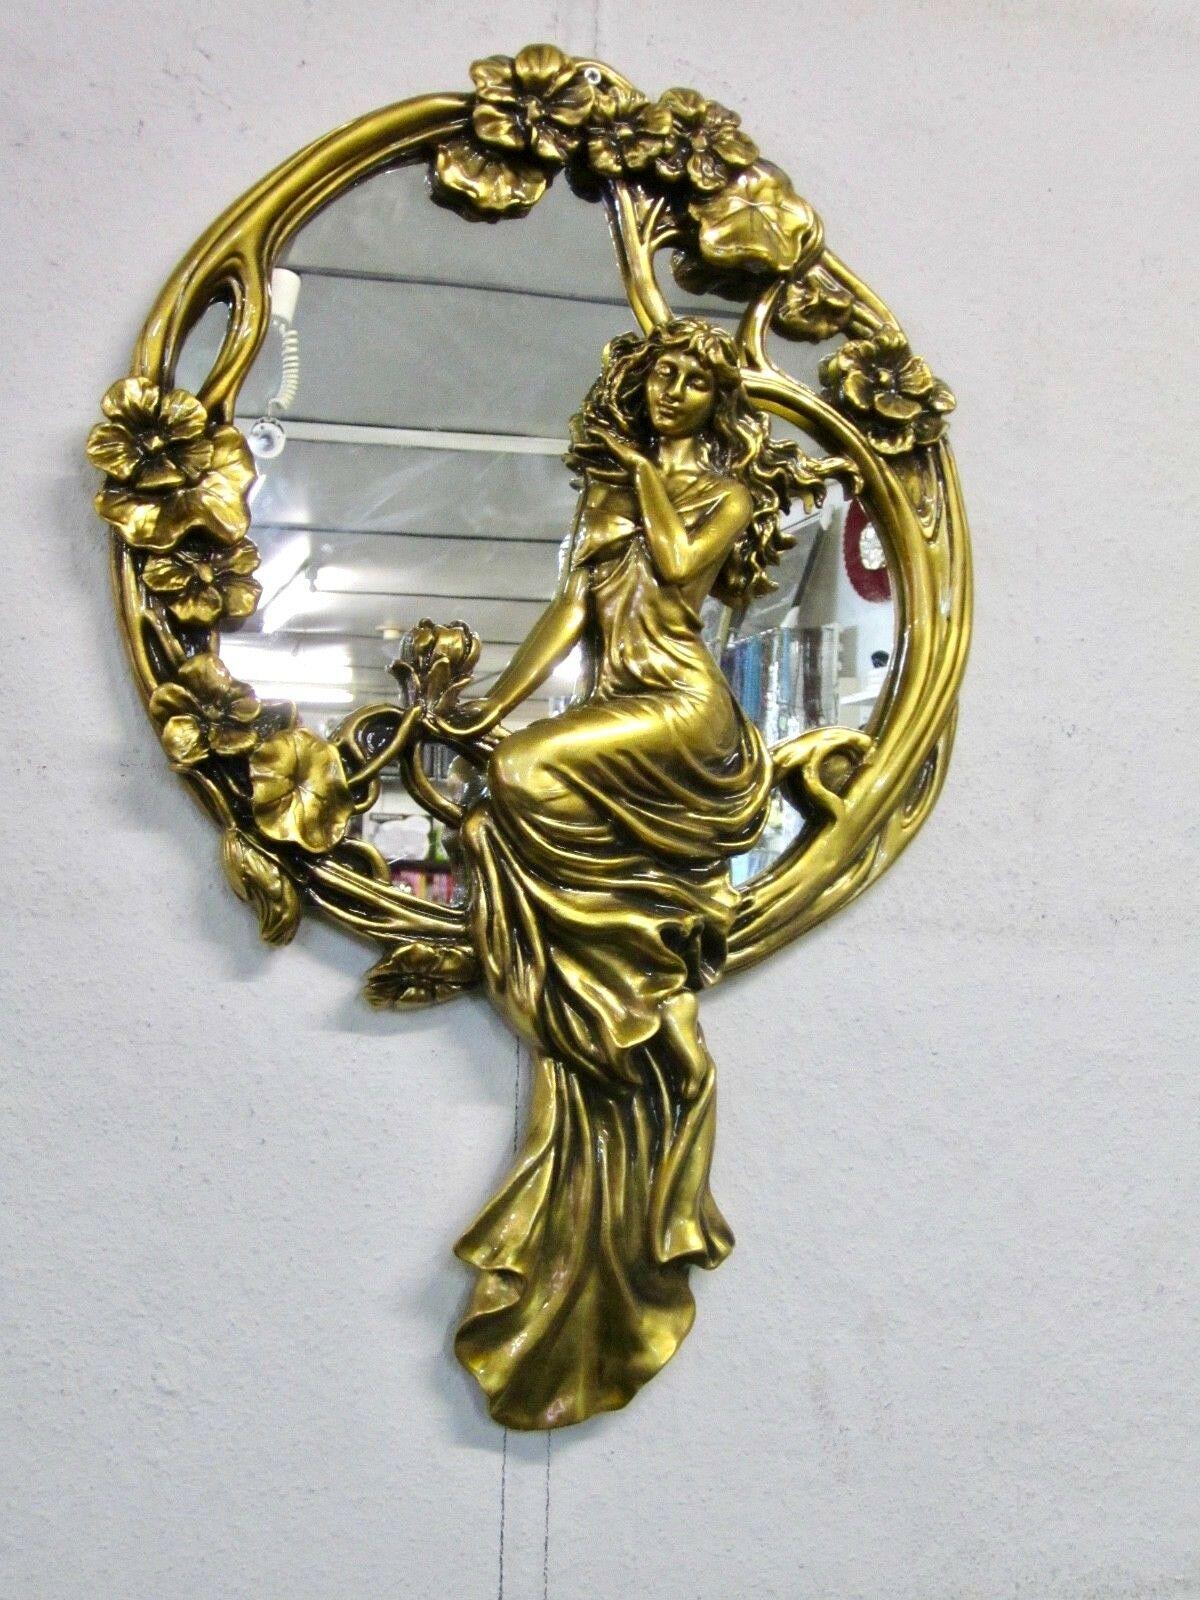 Wandspiegel Barock Gold 67x45cm Massiv Flurspiegel Antik Dekorative